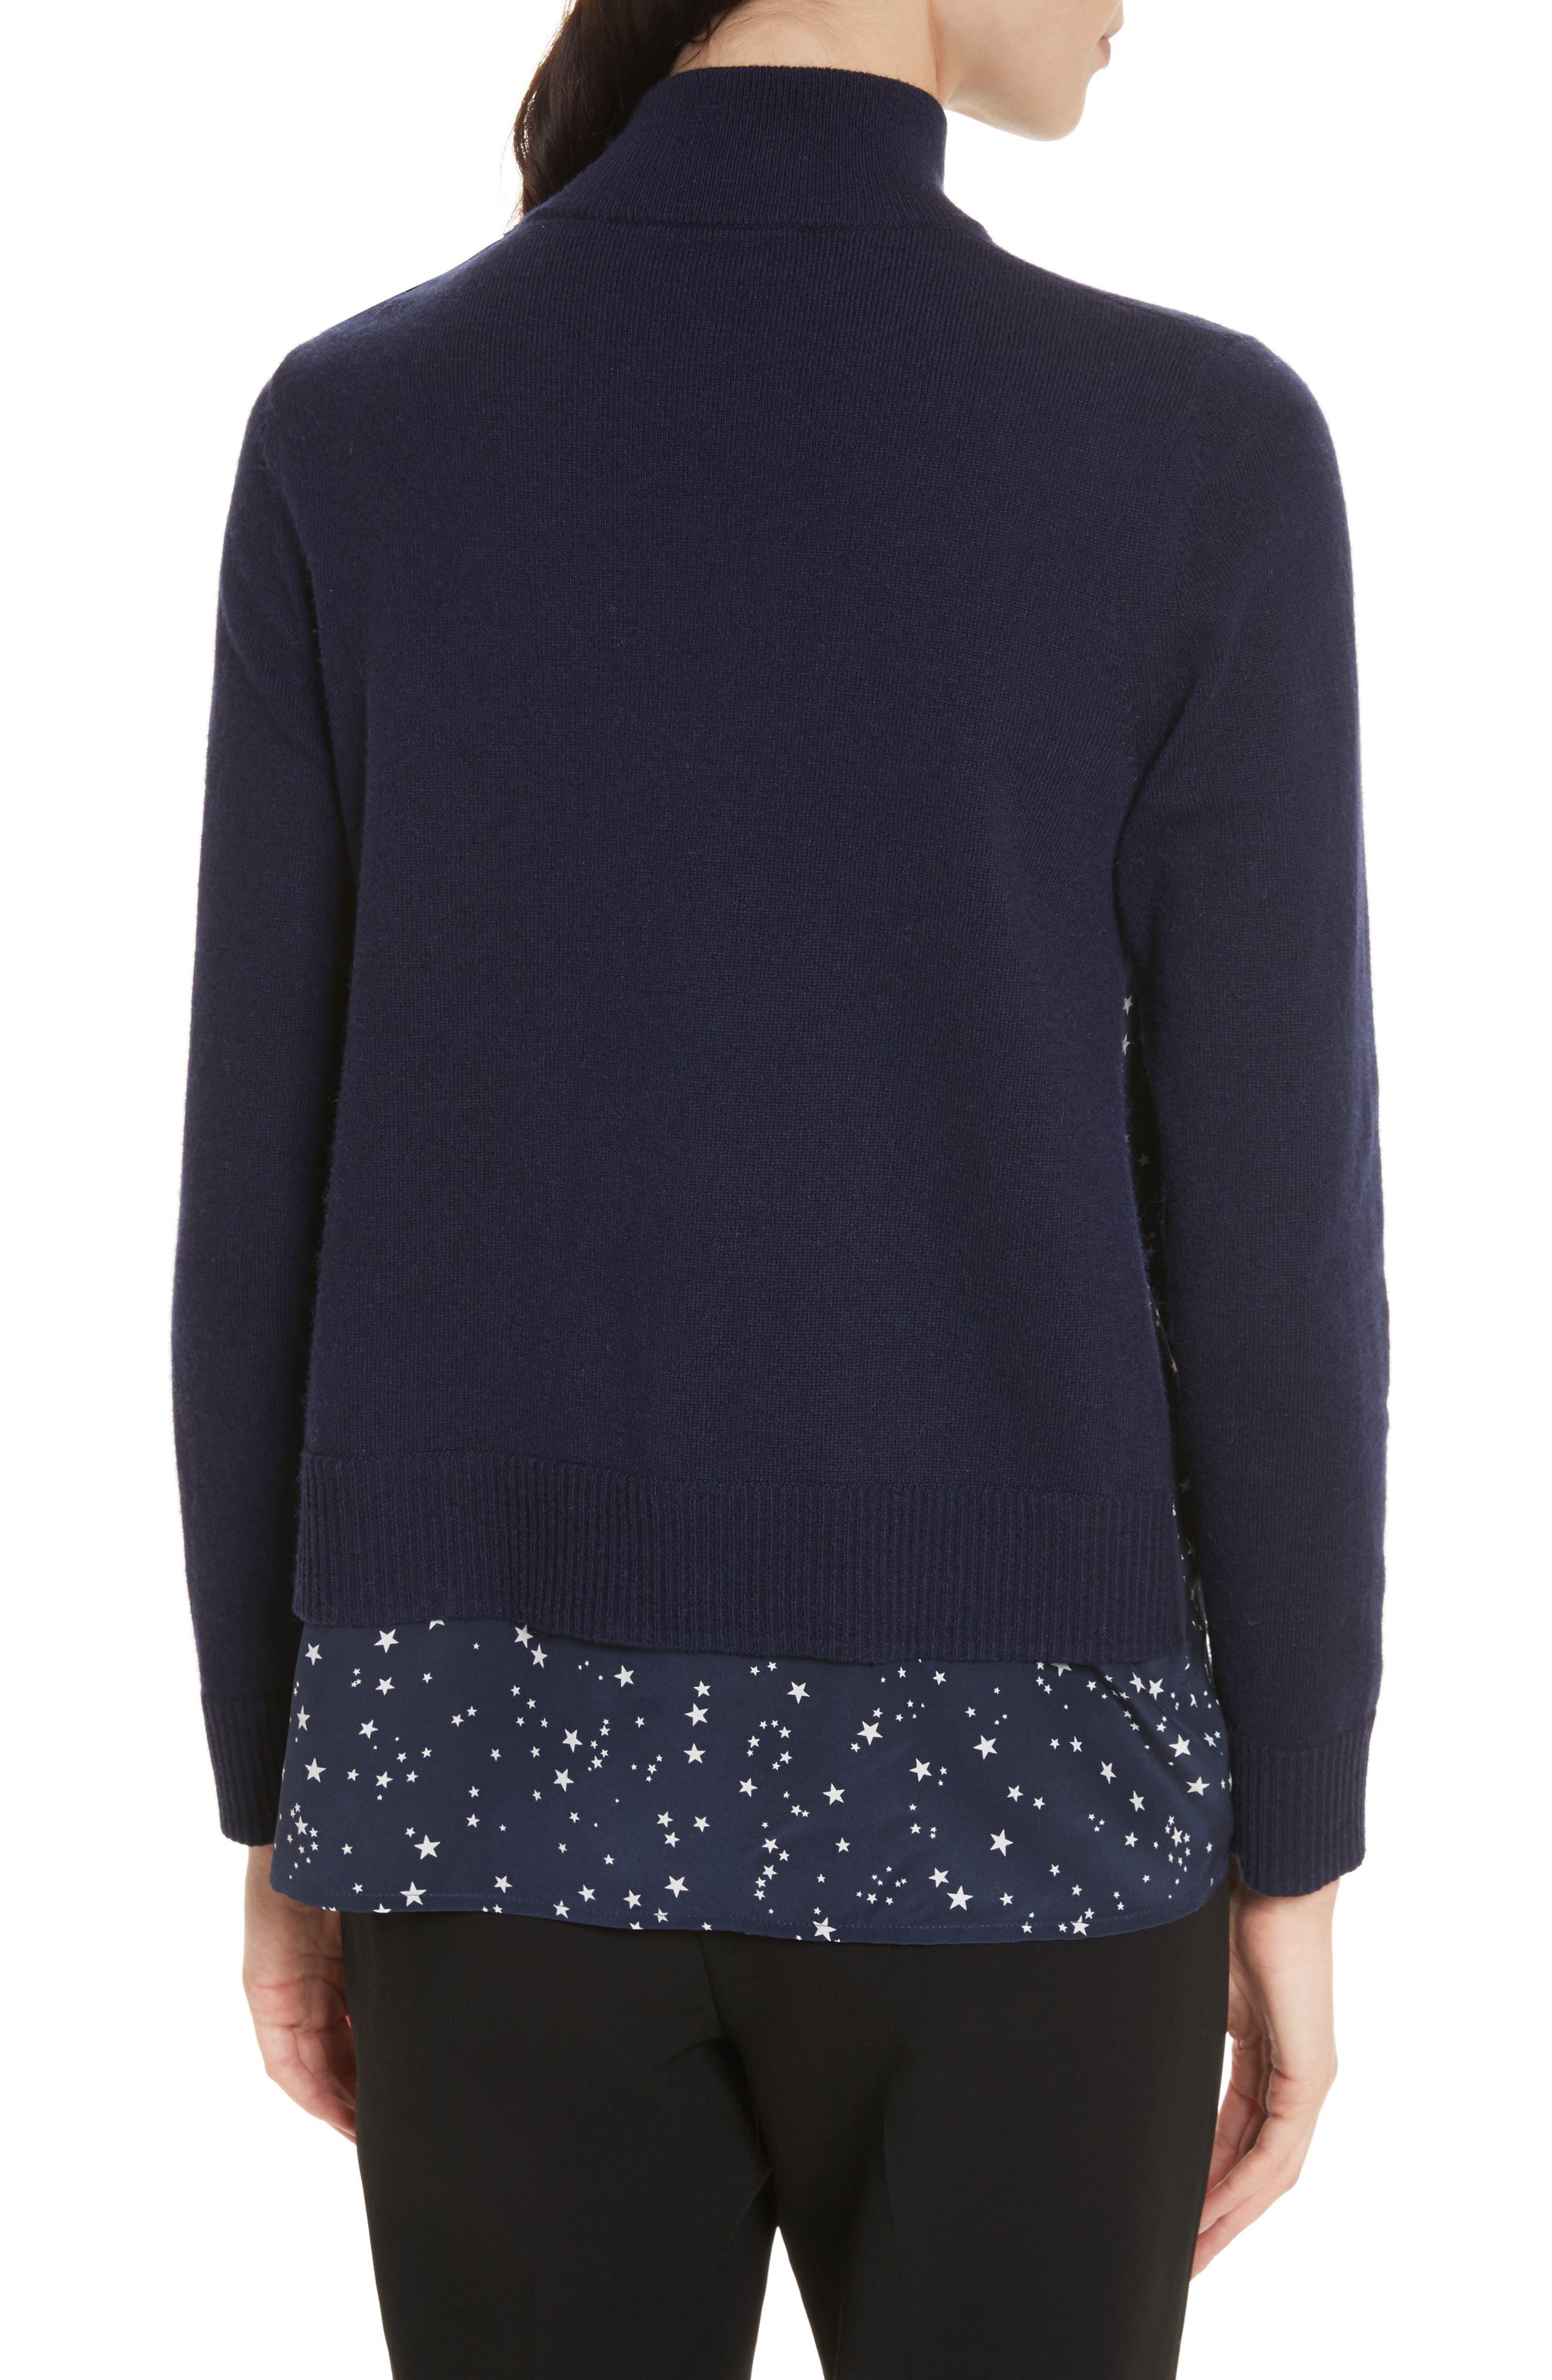 night sky mixed media sweater,                             Alternate thumbnail 2, color,                             Rich Navy